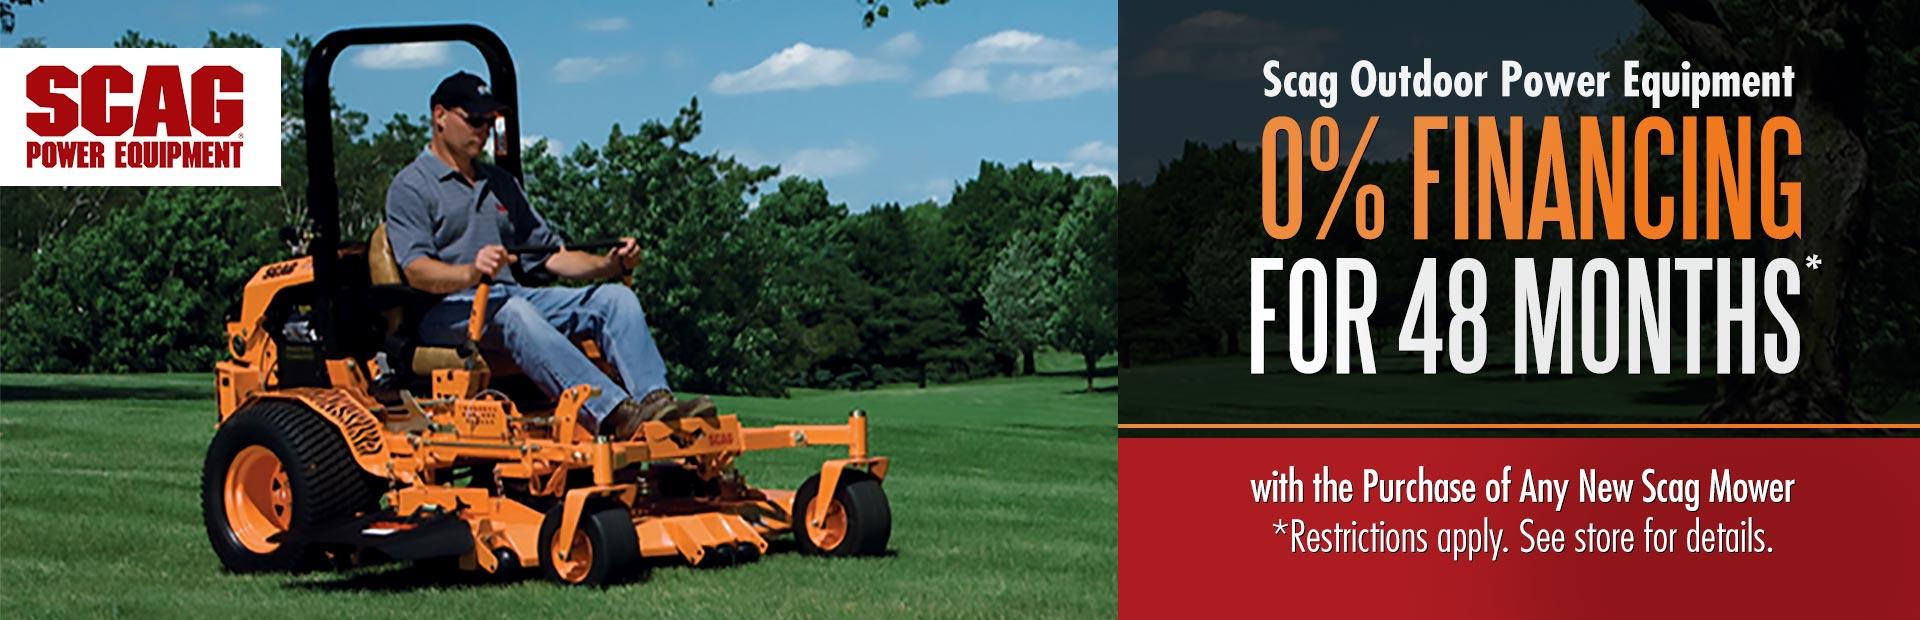 Home Premier Outdoor Power Equipment Franklin, IN (317) 738-0618